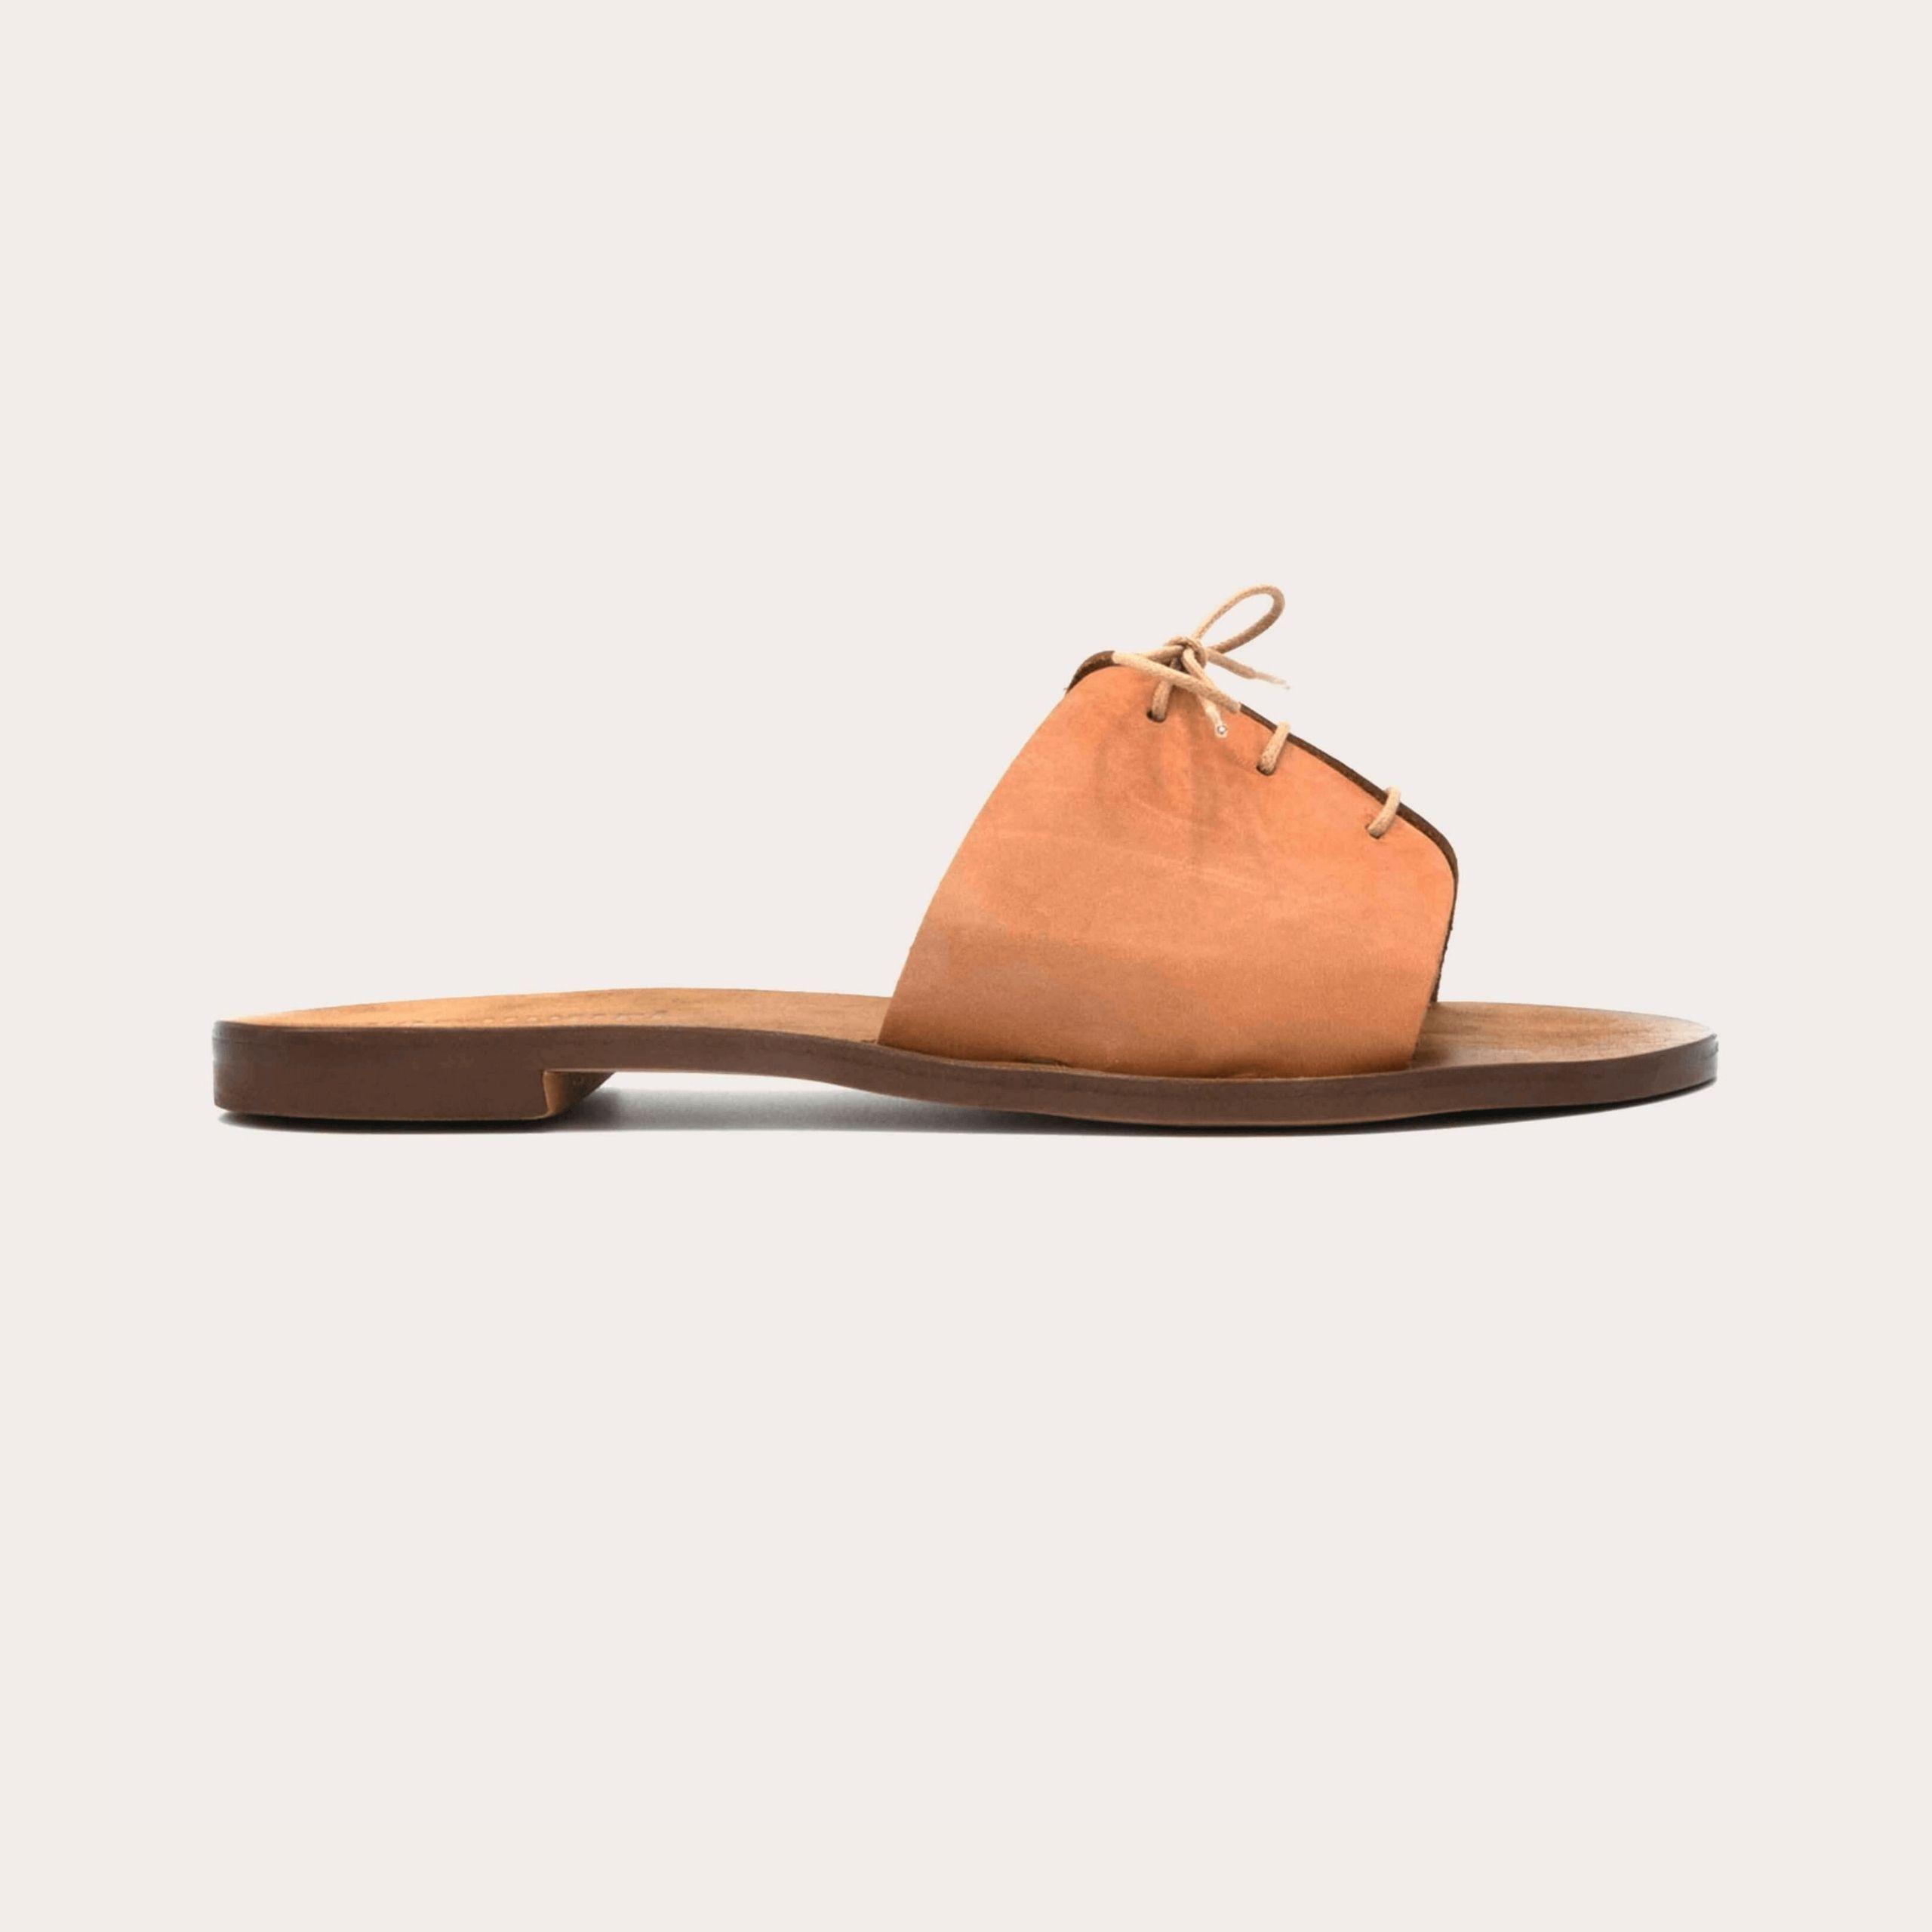 cali-rose_1_lintsandalen sandals travelsandals vegan sustainable sandals wikkelsandalen